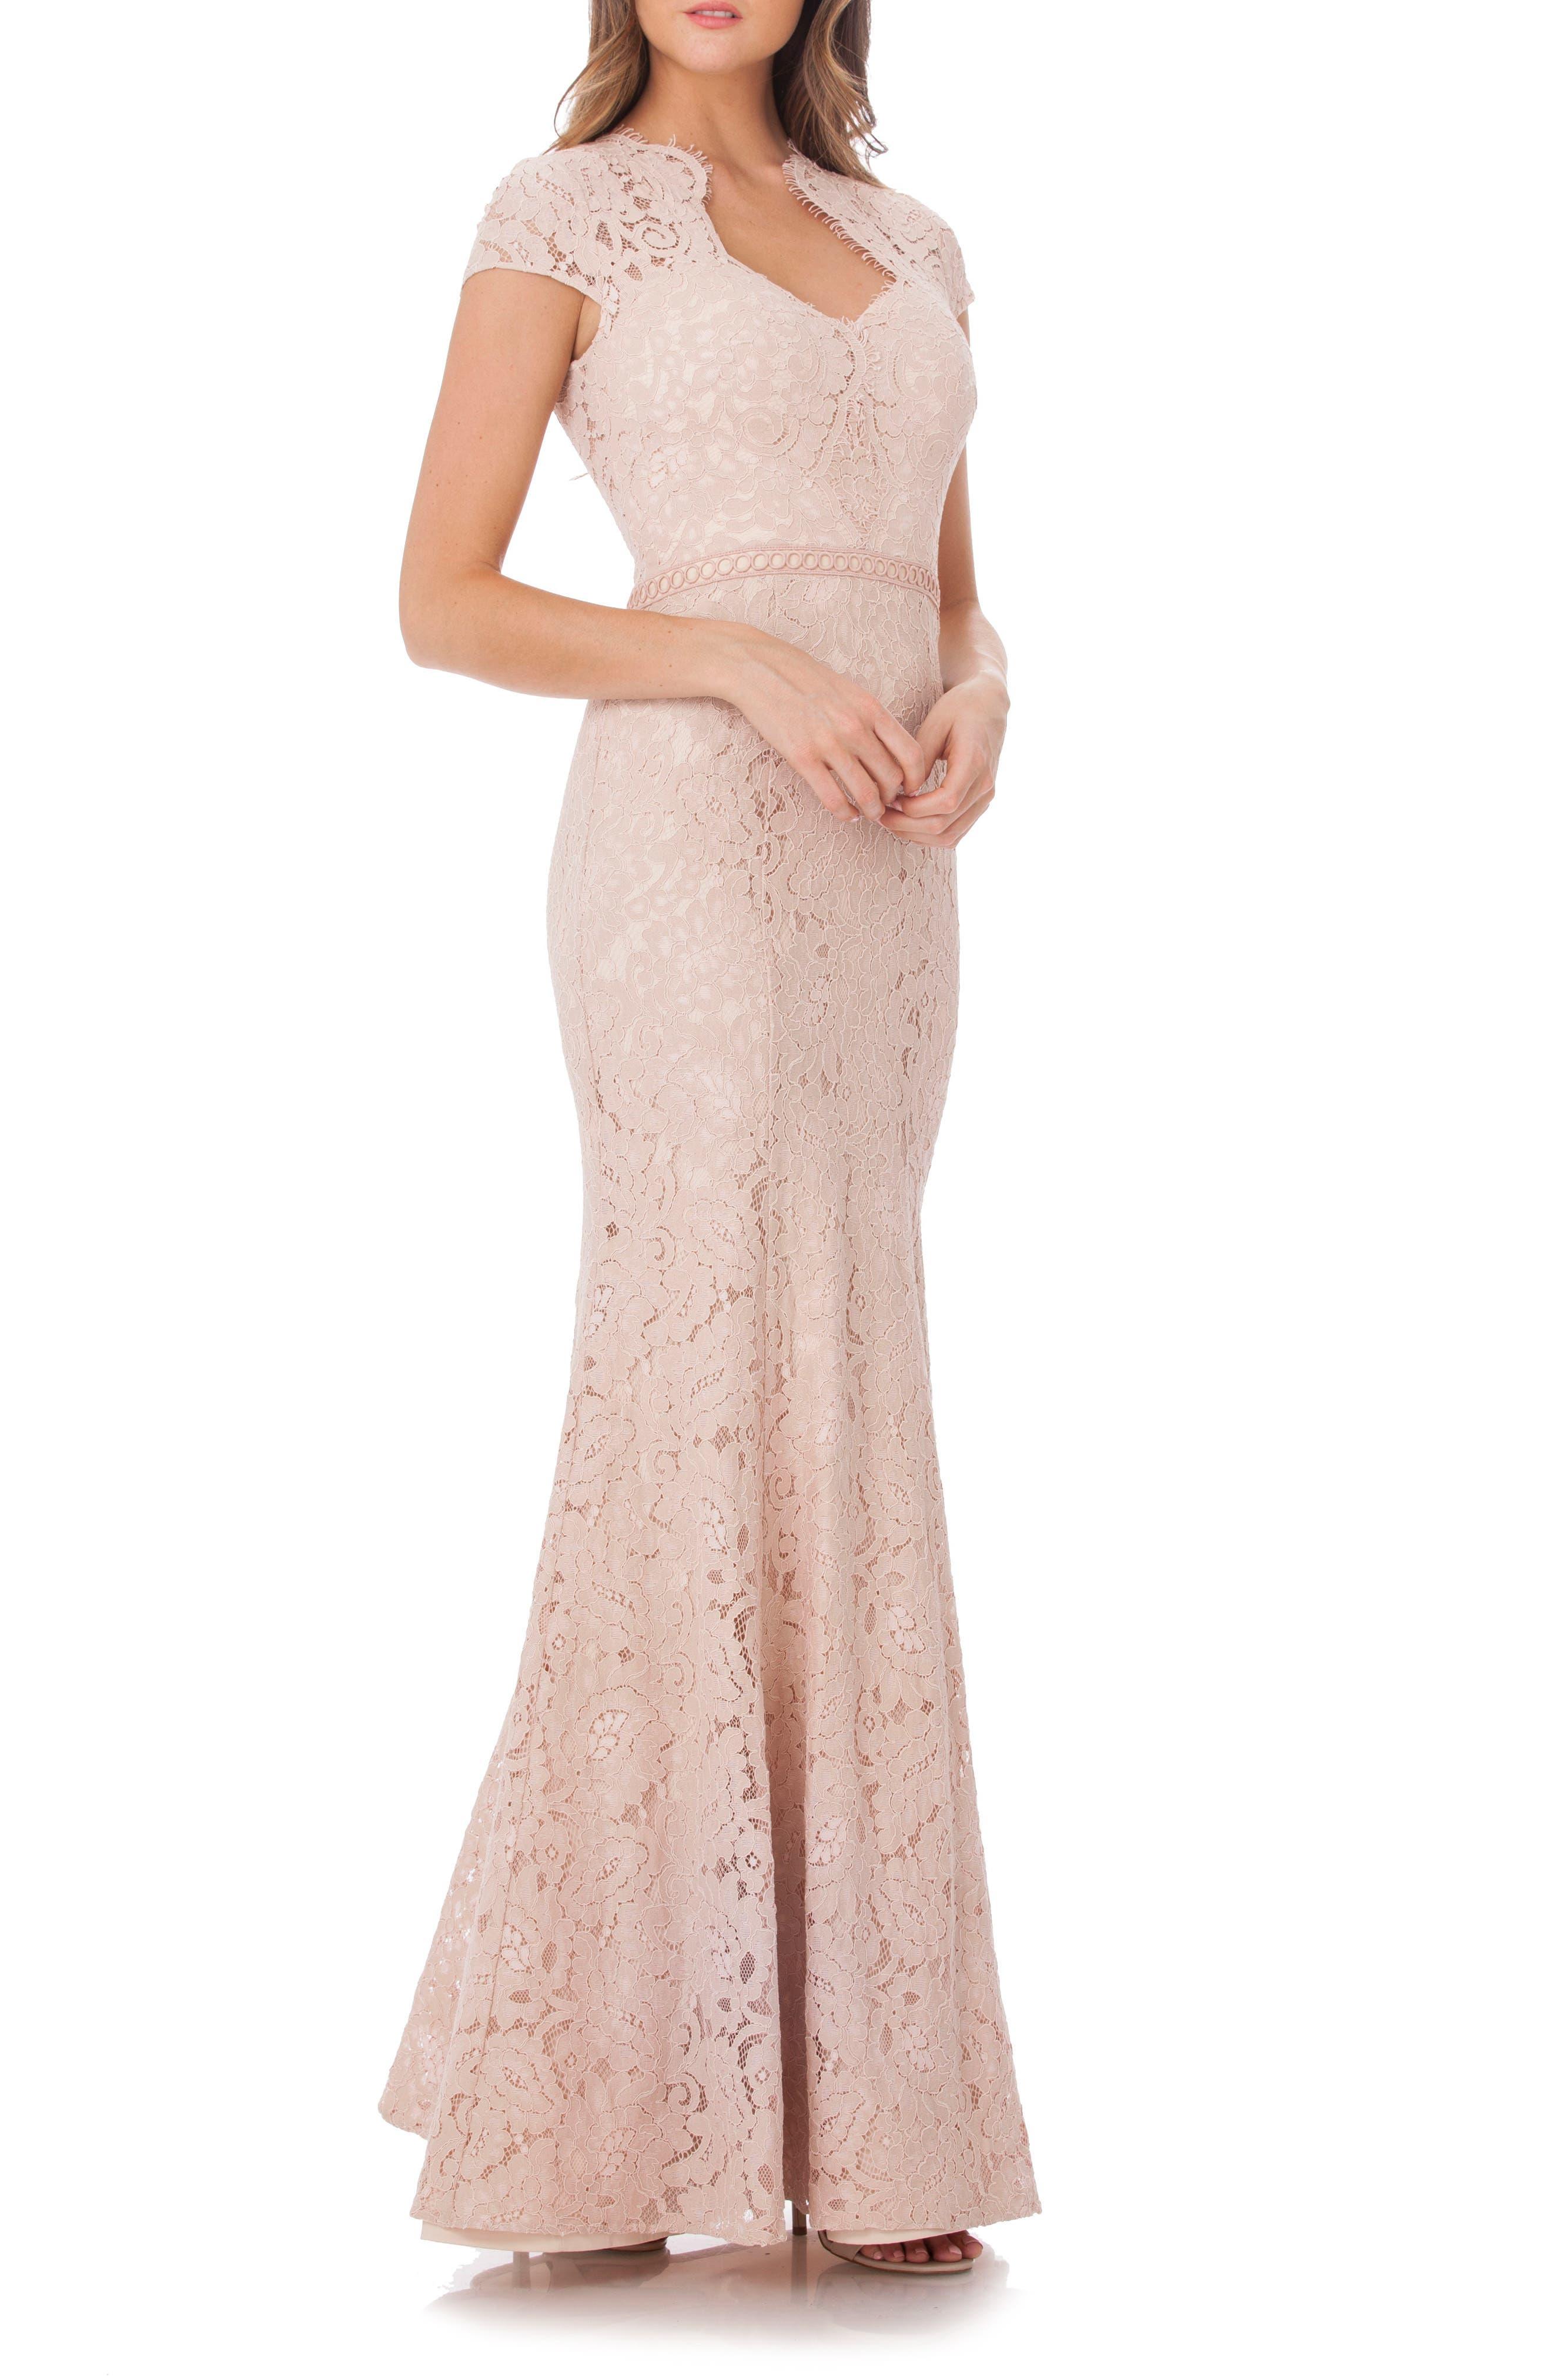 Lace Mermaid Gown,                             Main thumbnail 1, color,                             Blush